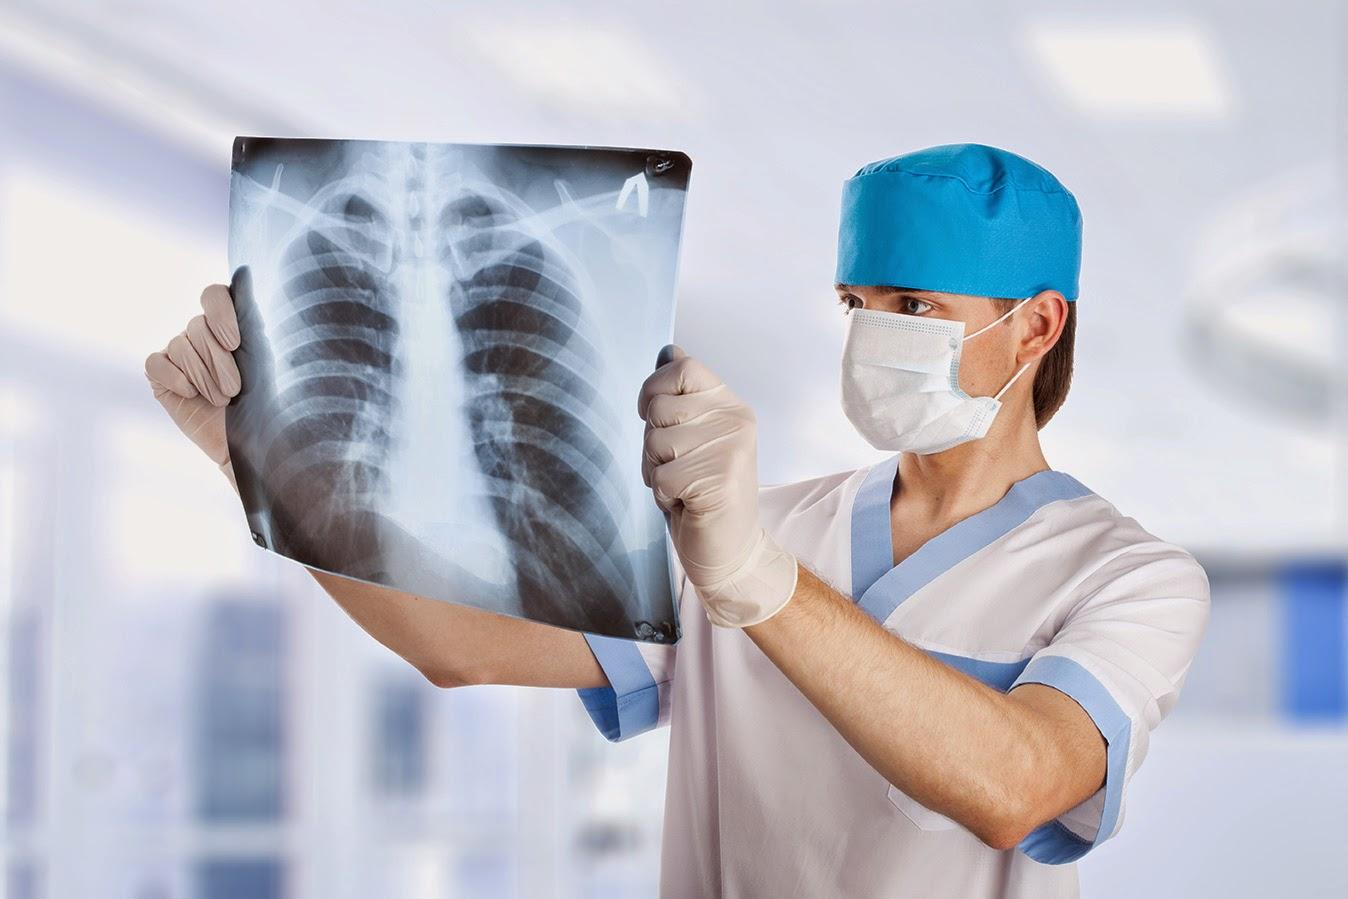 Radiology / Imaging diagnostics